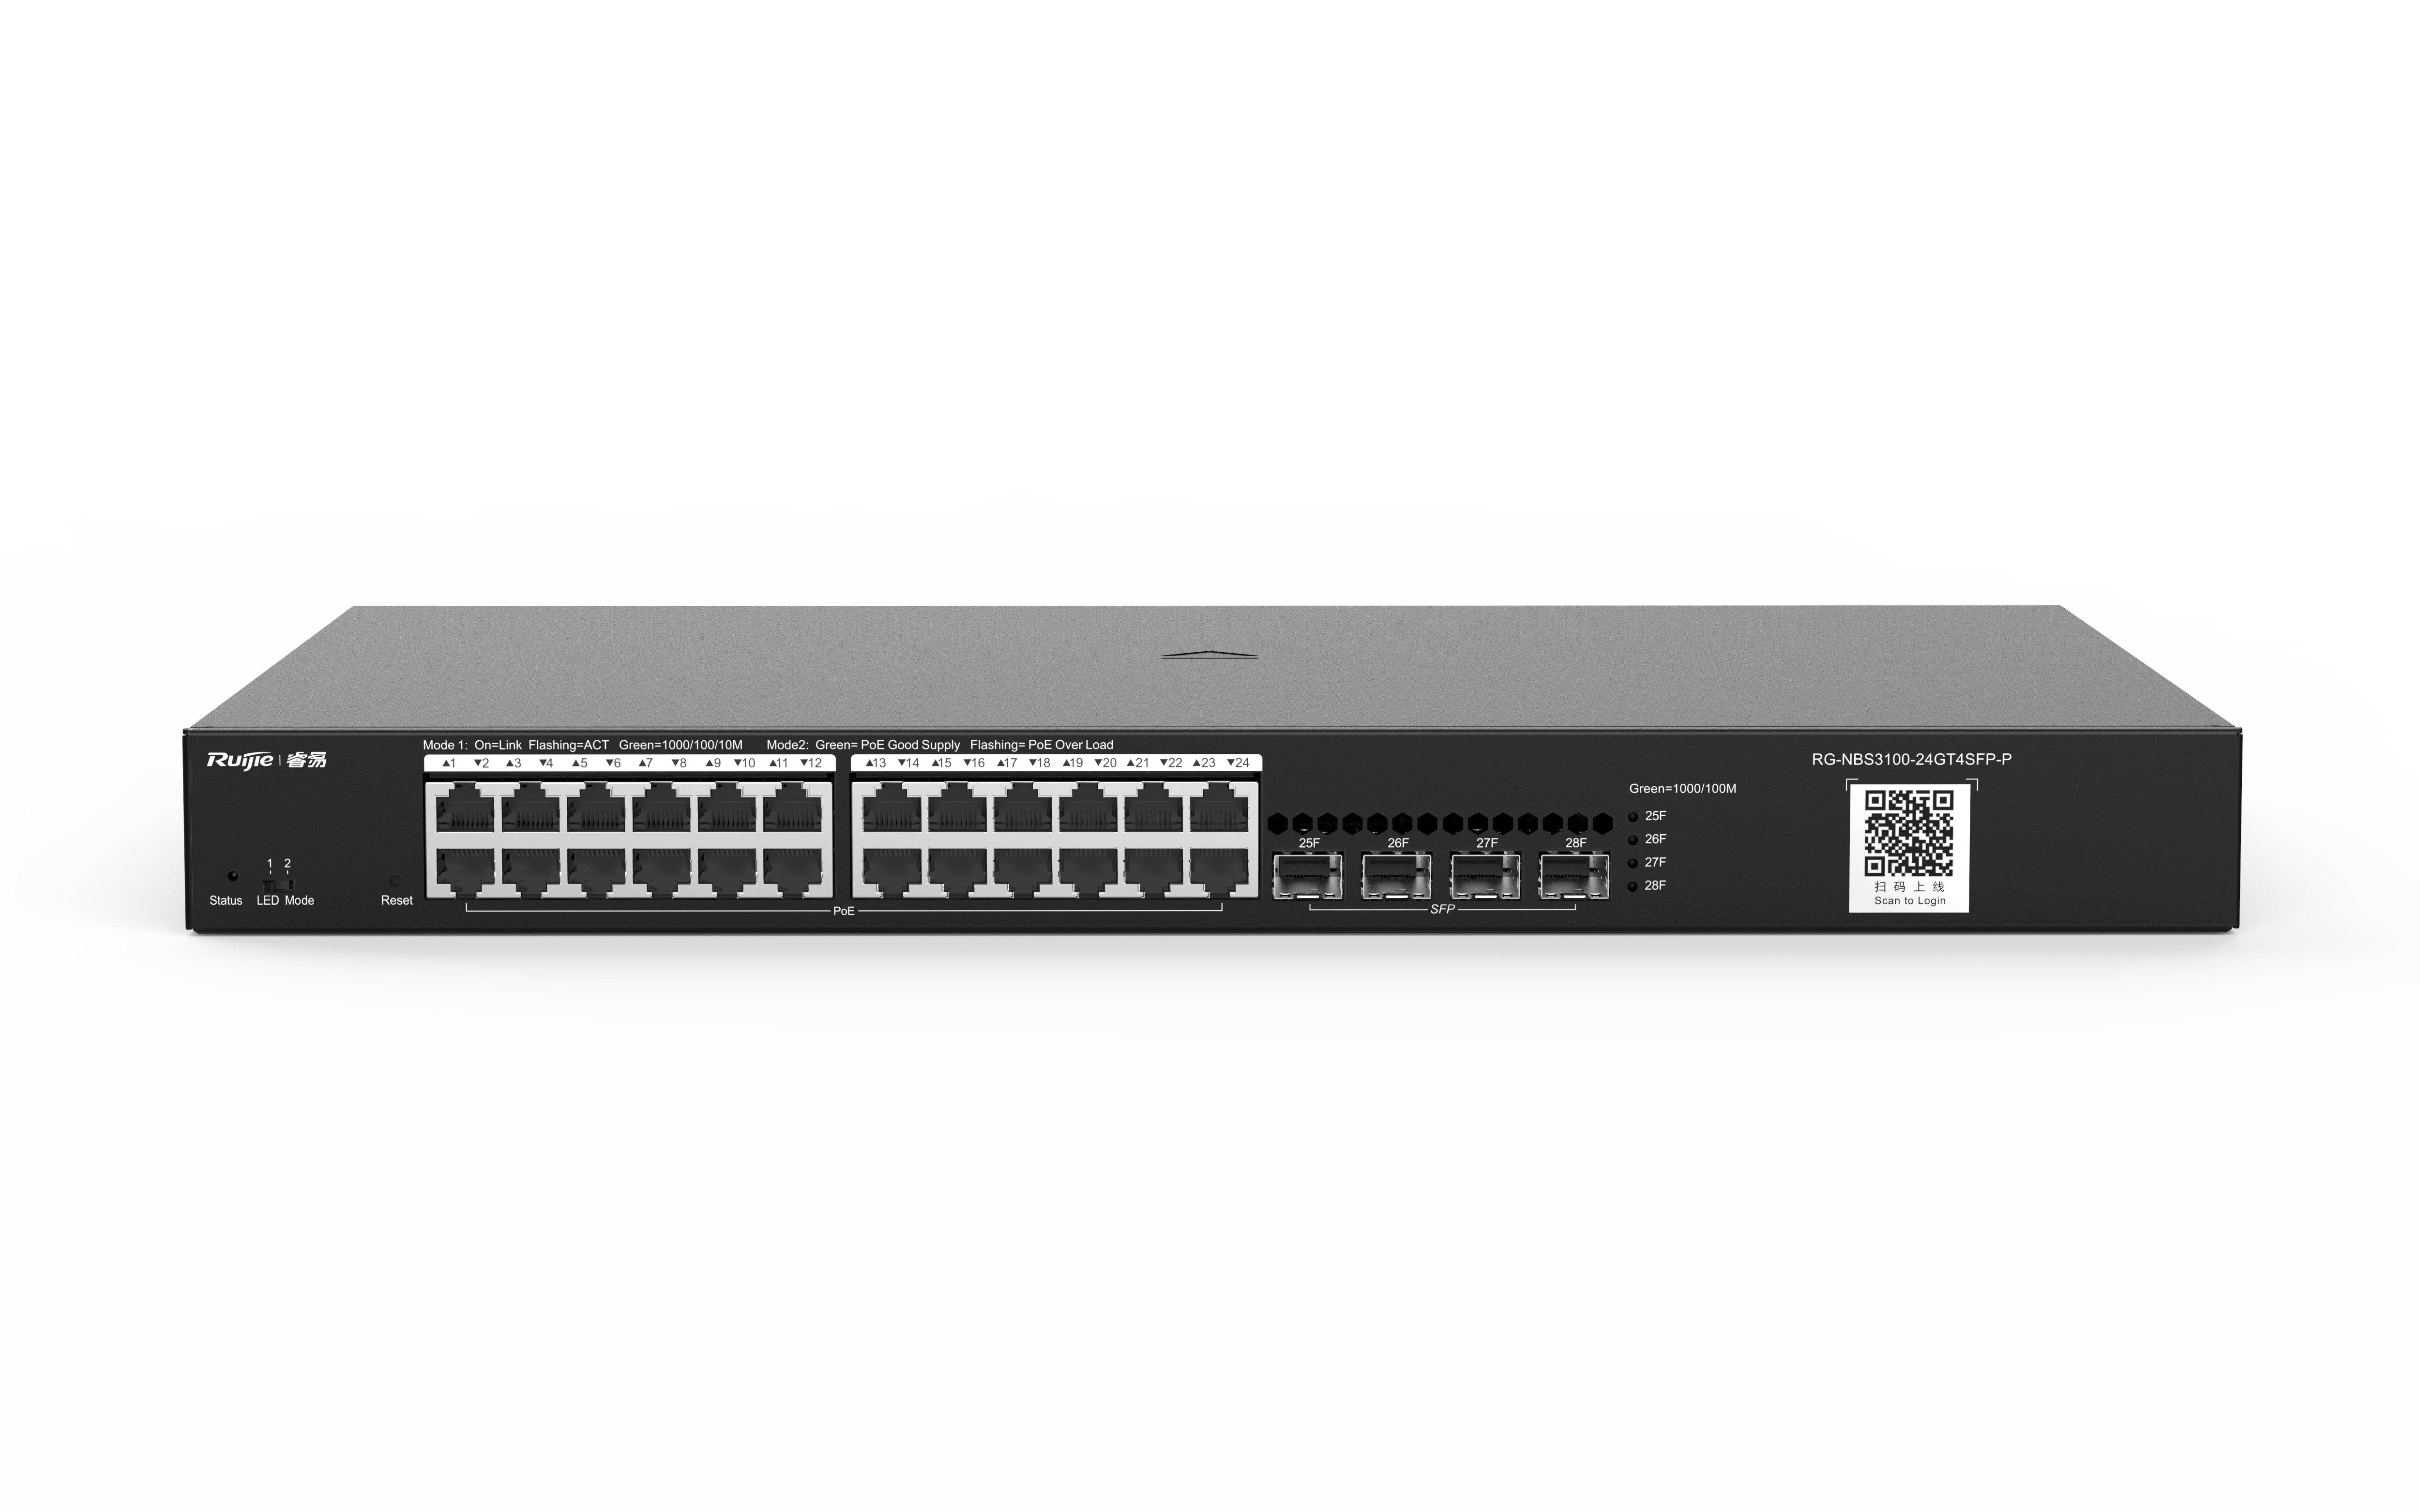 RG-NBS3100-24GT4SFP-P24口千兆接入千兆上联二层网管PoE交换机